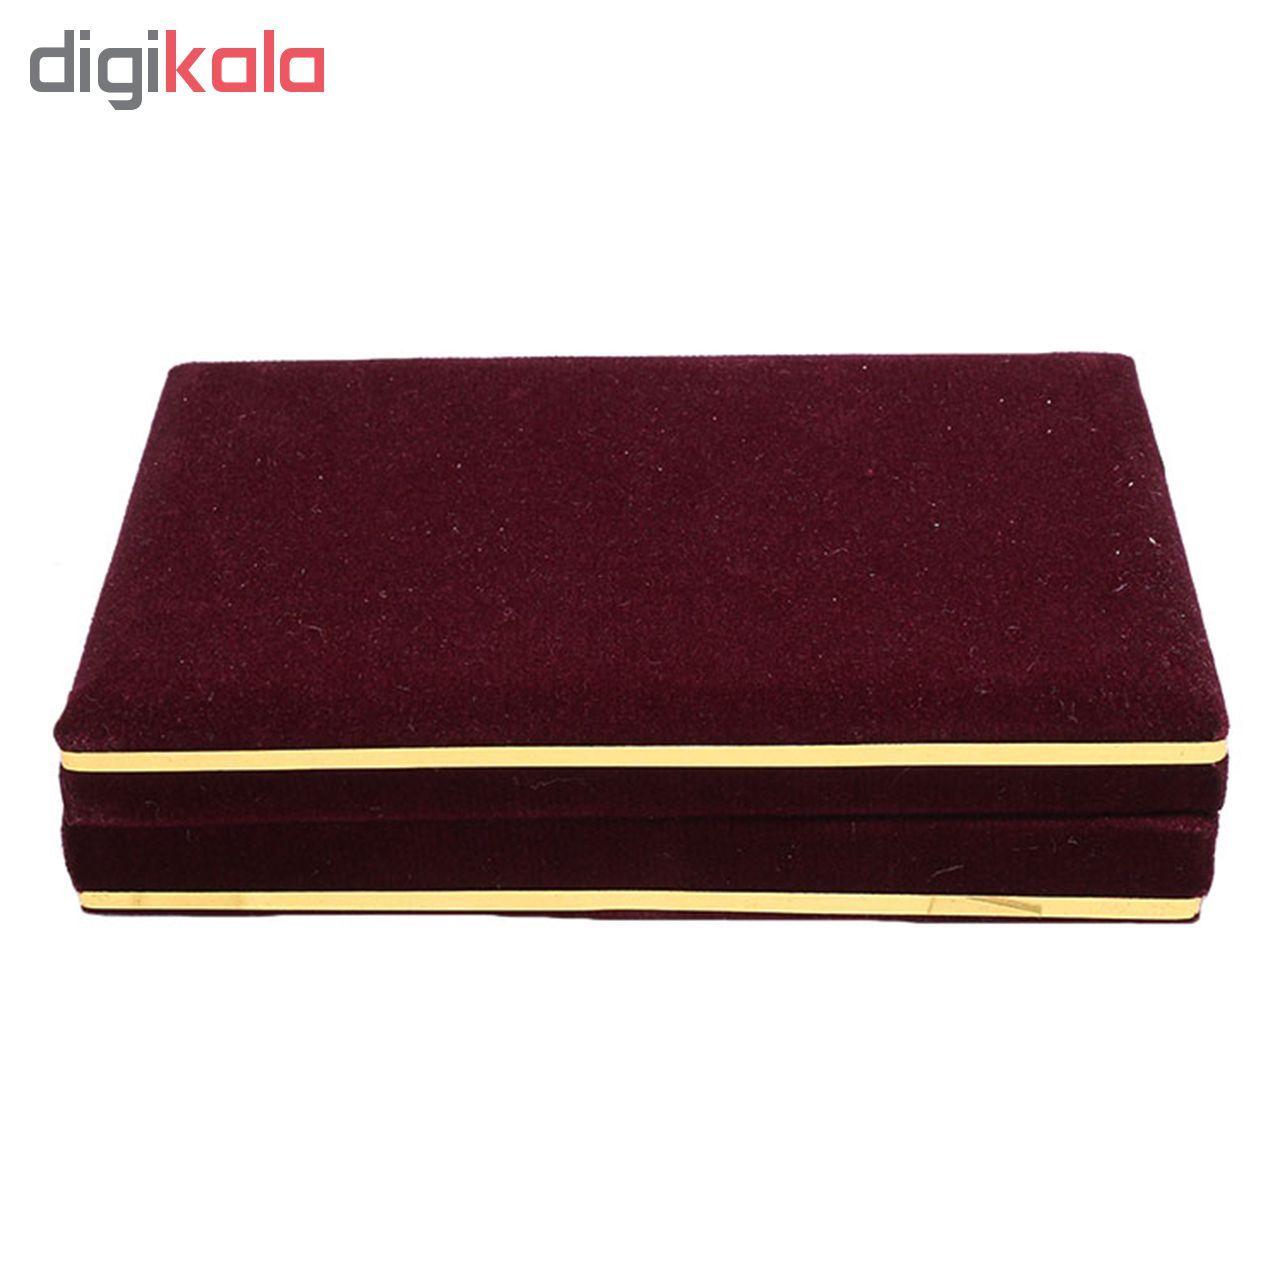 جعبه جواهرات کد b001 main 1 1